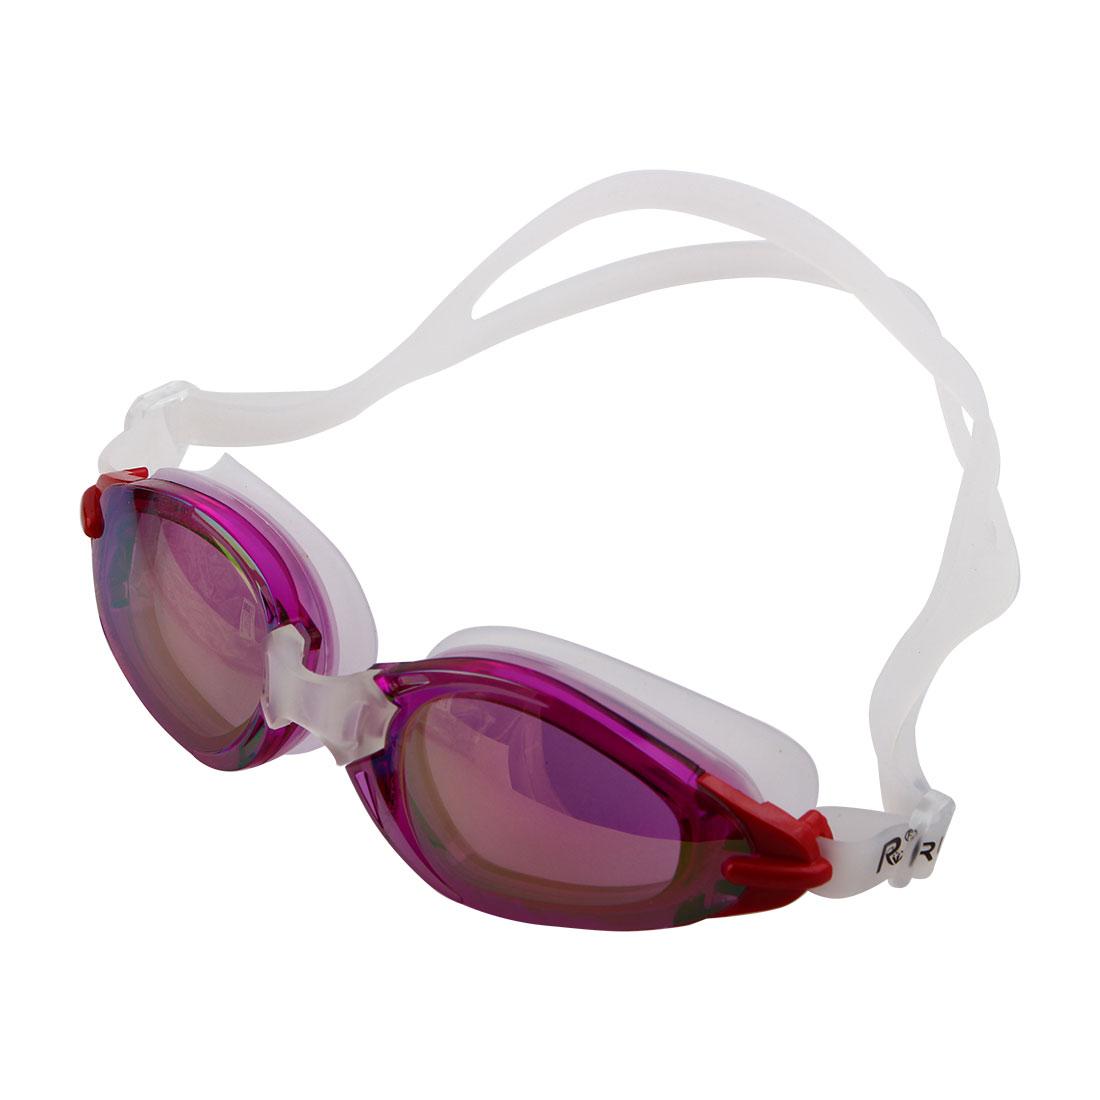 Silicone Adjustable Belt Clear Vision Anti Fog Swim Glasses Swimming Goggles Purple w Storage Case for Men Women